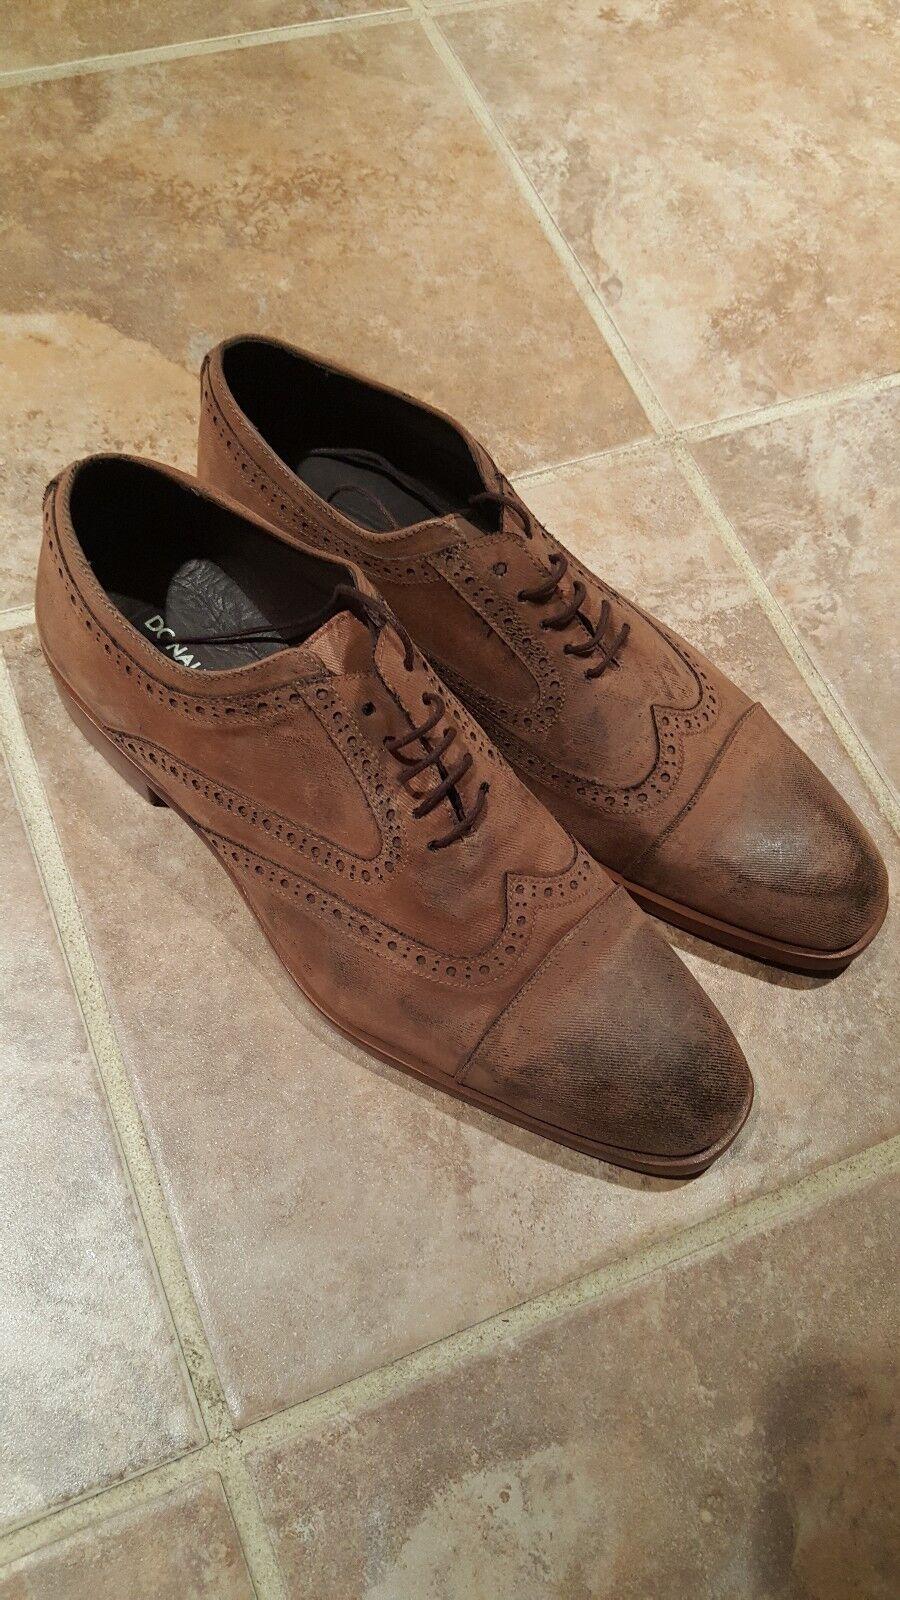 Men Donald Pliner TIE Up Leather Wing Tip shoes SIZE 9 M NWOB